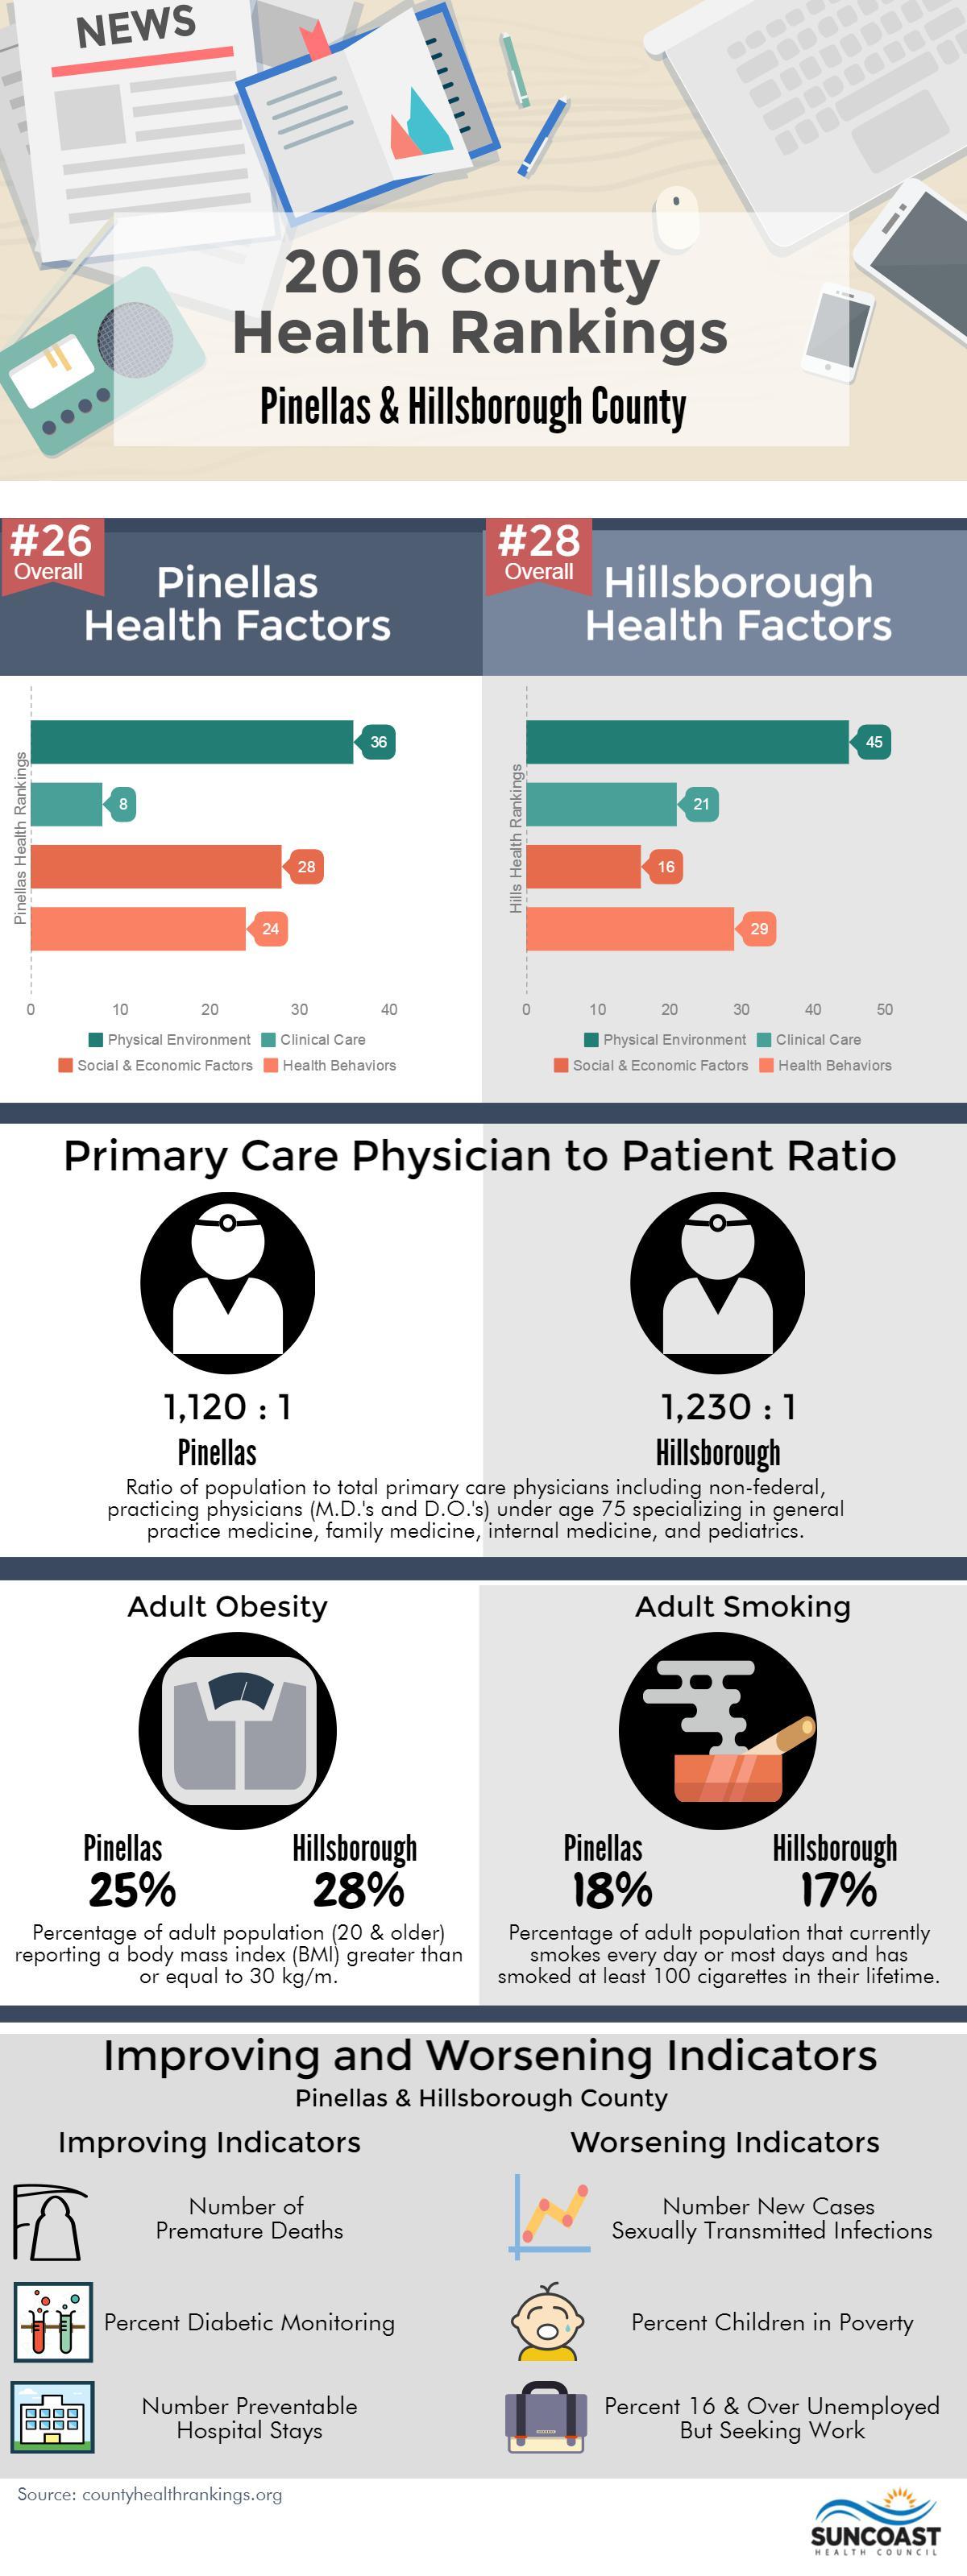 Health Rankings — Pinellas County and Hillsborough County | Joseph Rugg's  Health Law Blog